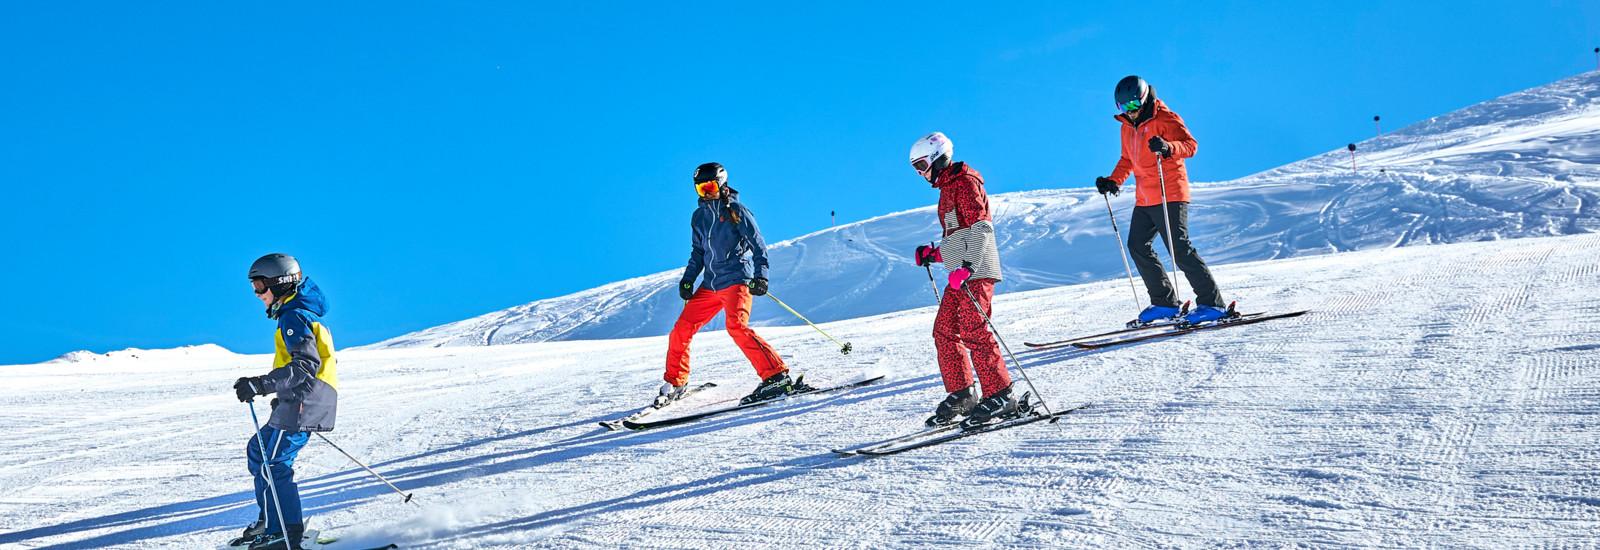 Skifahren in See